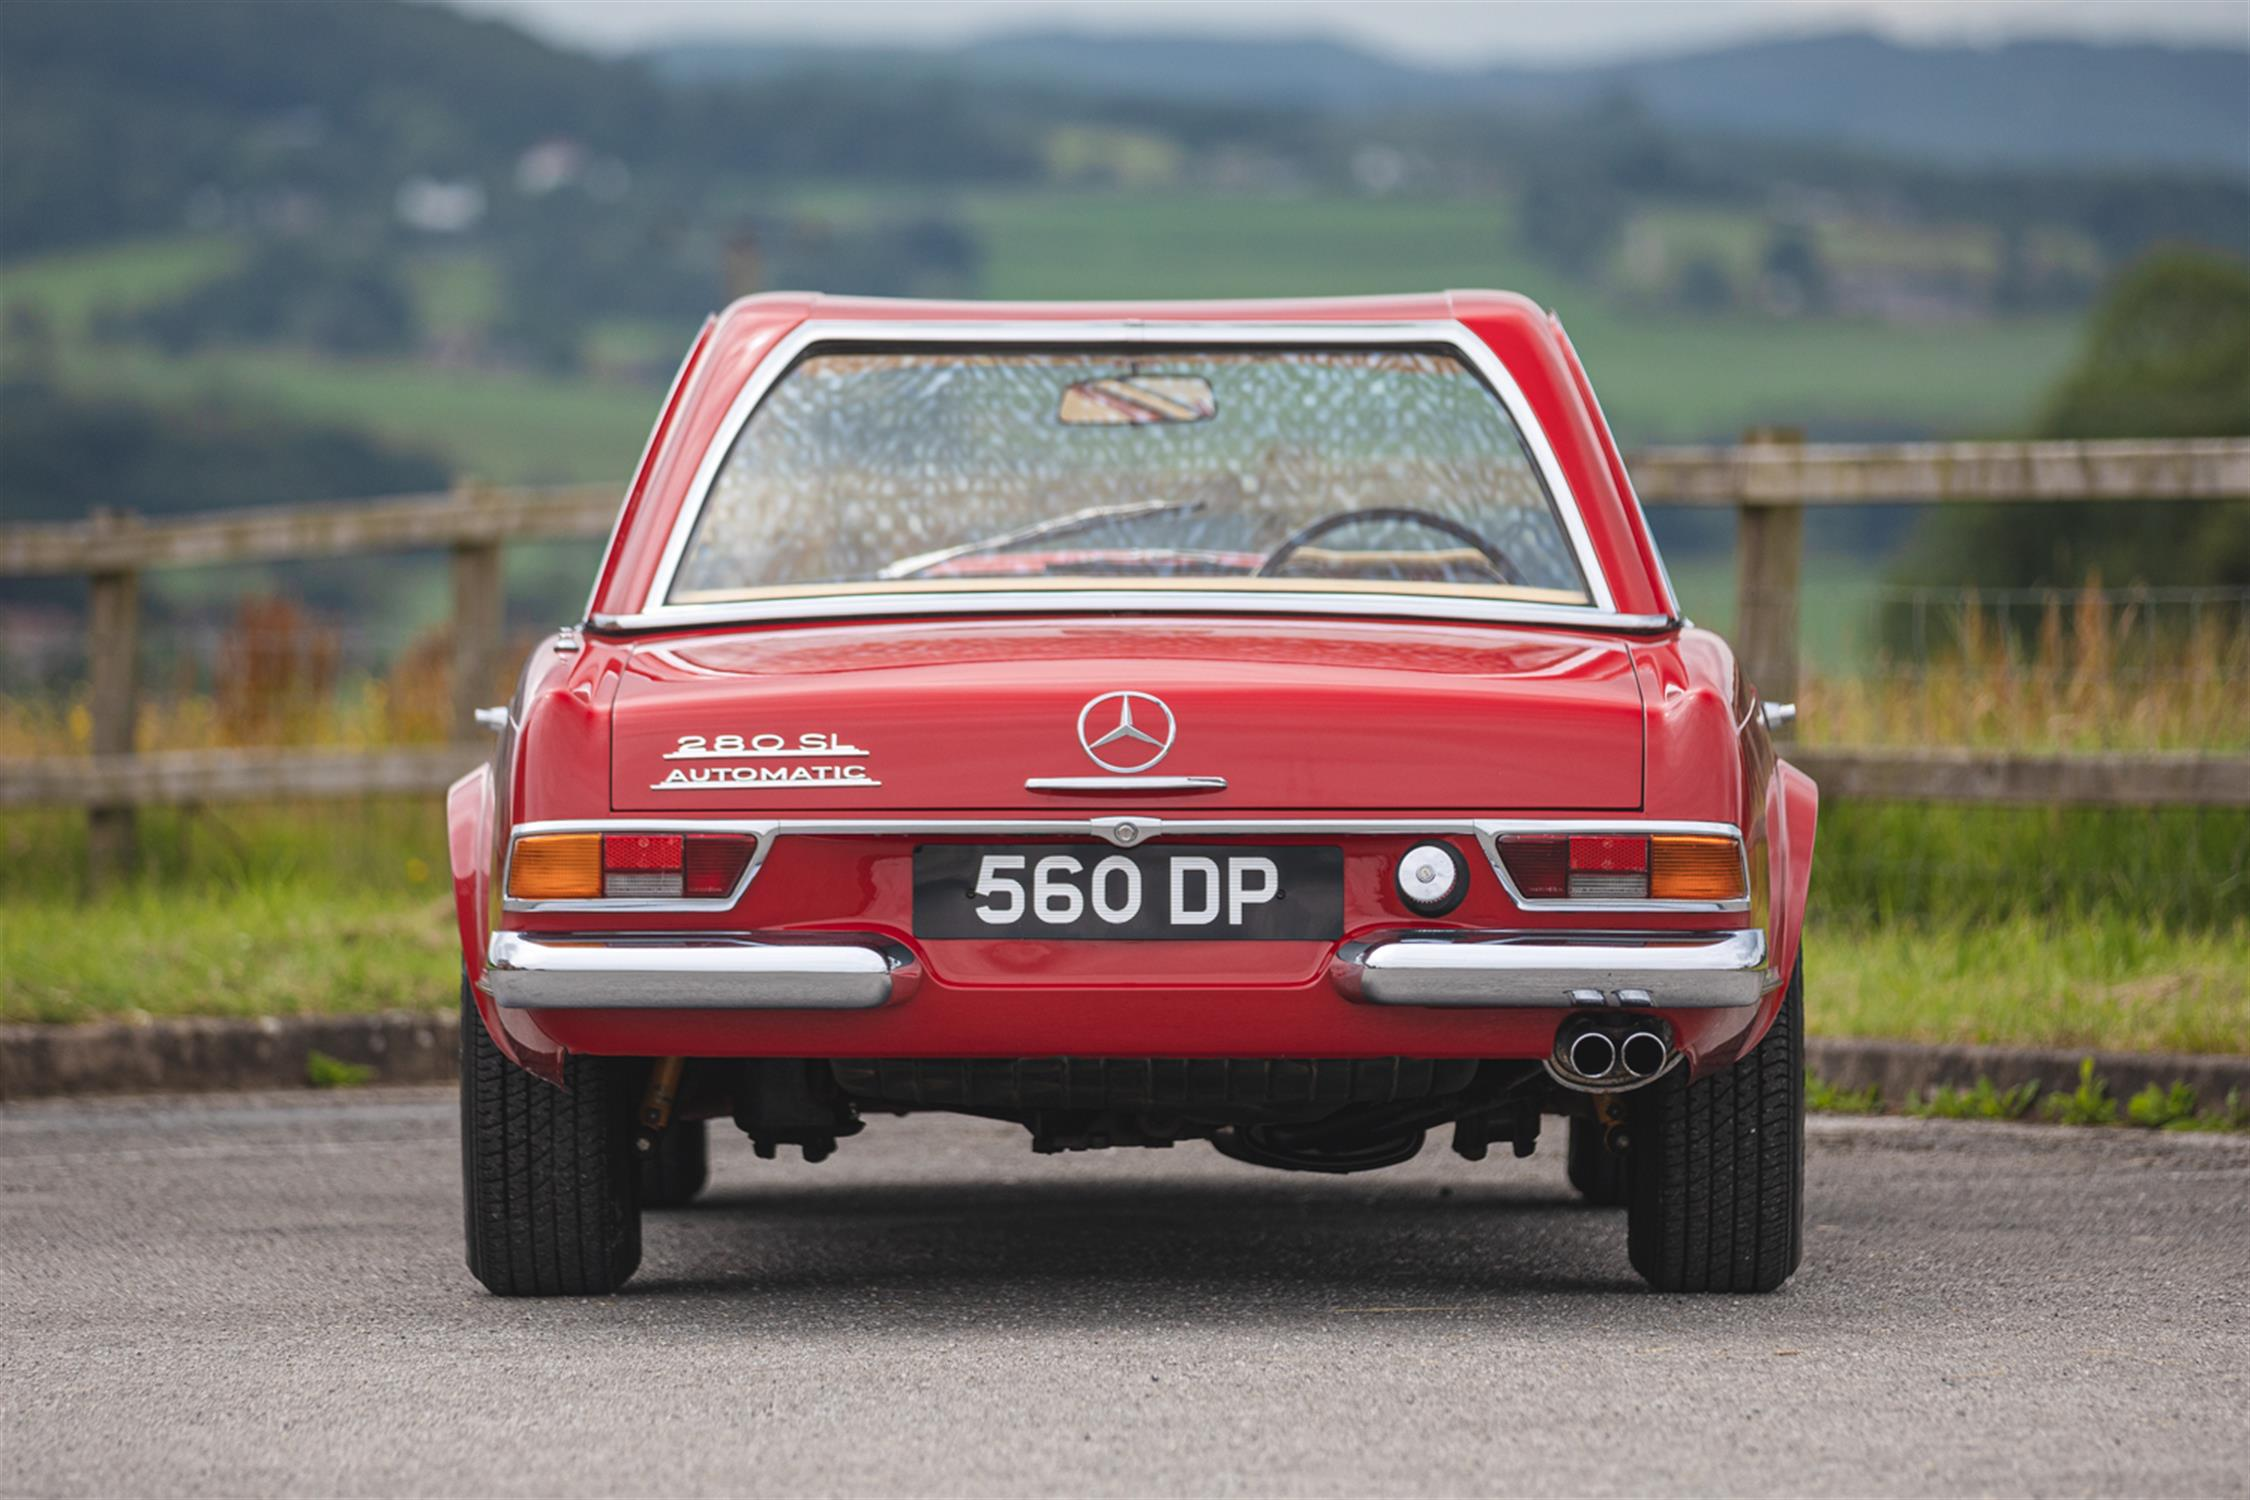 1969 Mercedes-Benz 280SL (W113) - Image 2 of 10